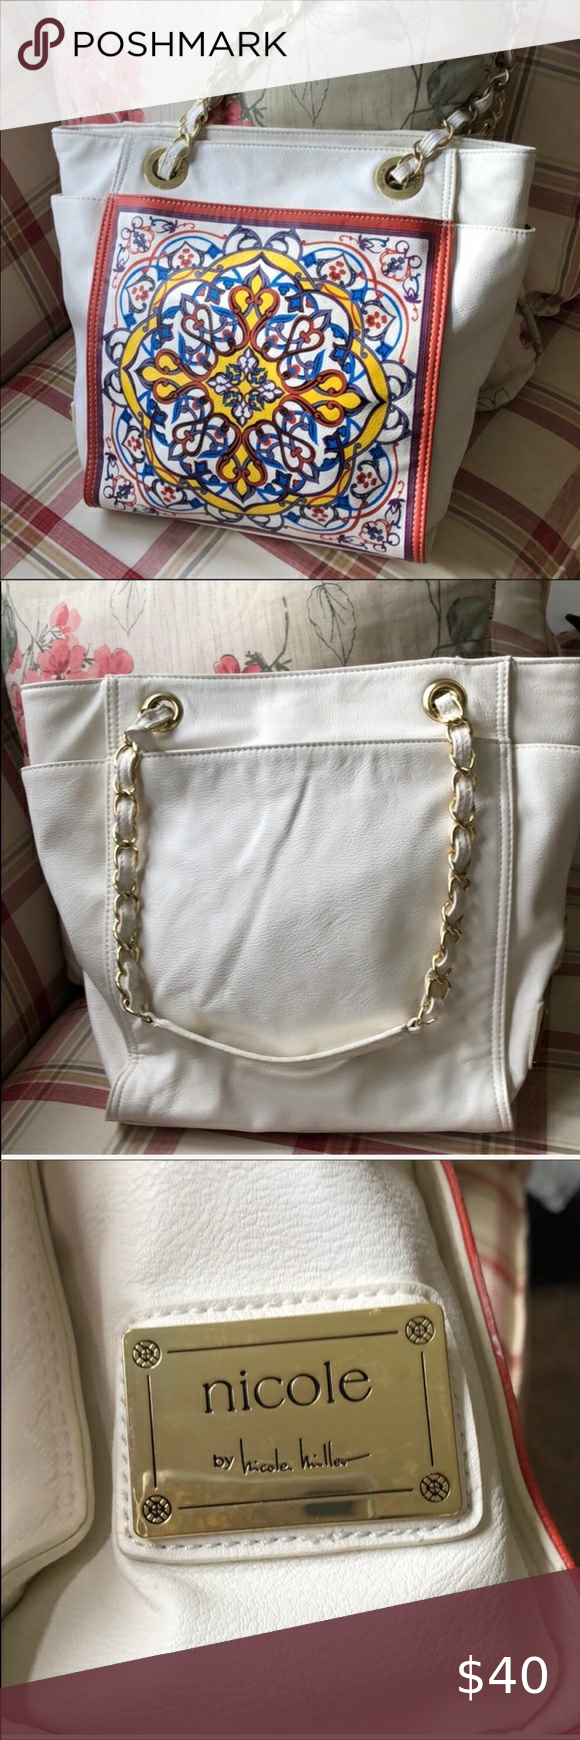 Handbag Nicole Miller Tote in 2020 Womens tote bags